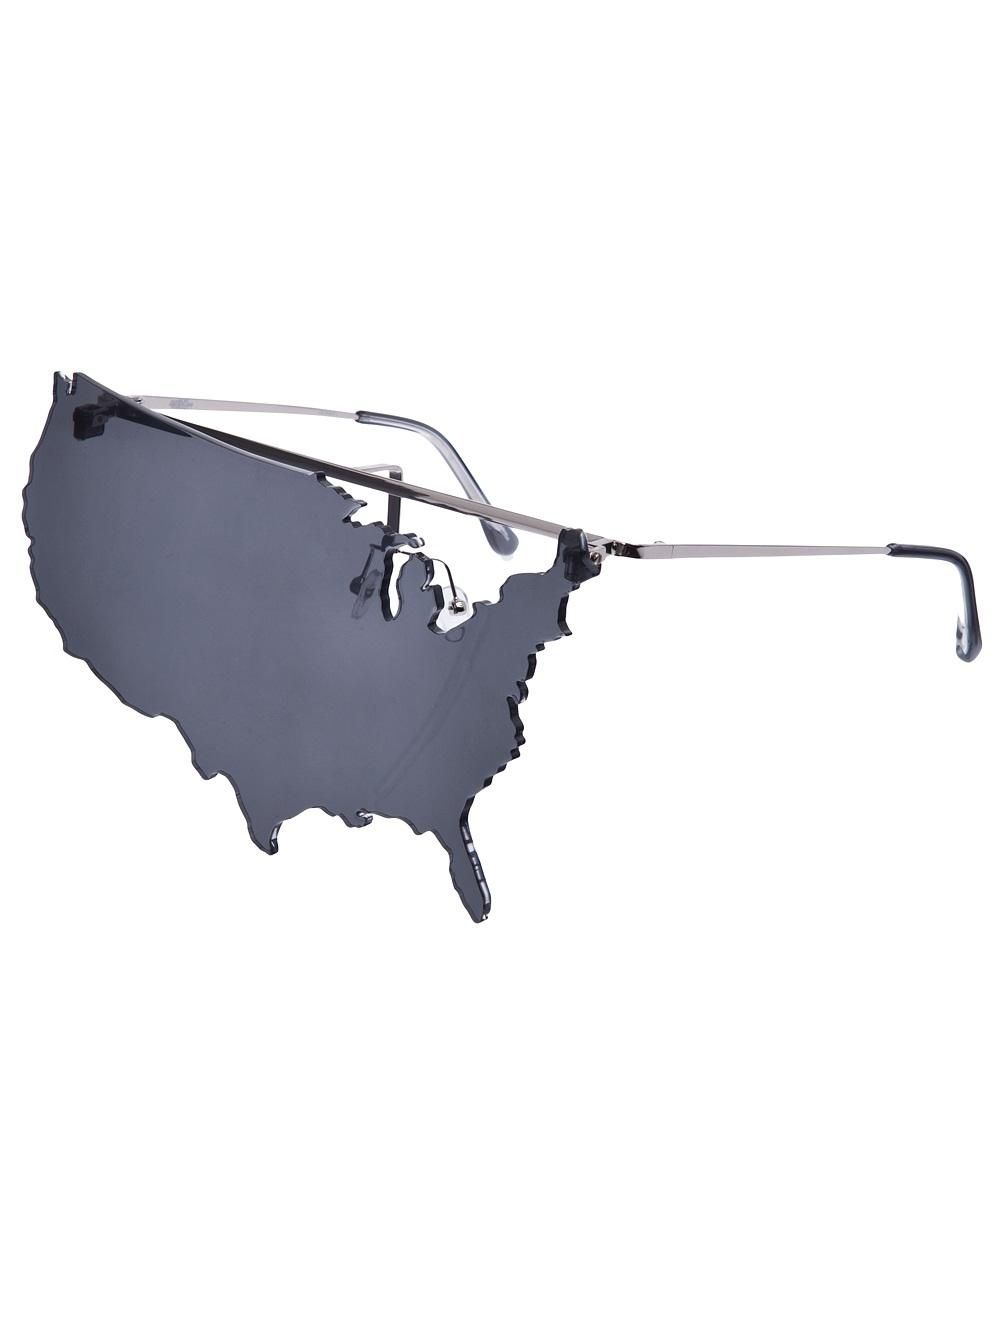 77ec544c97cb Usa Sunglasses by LINDA FARROW